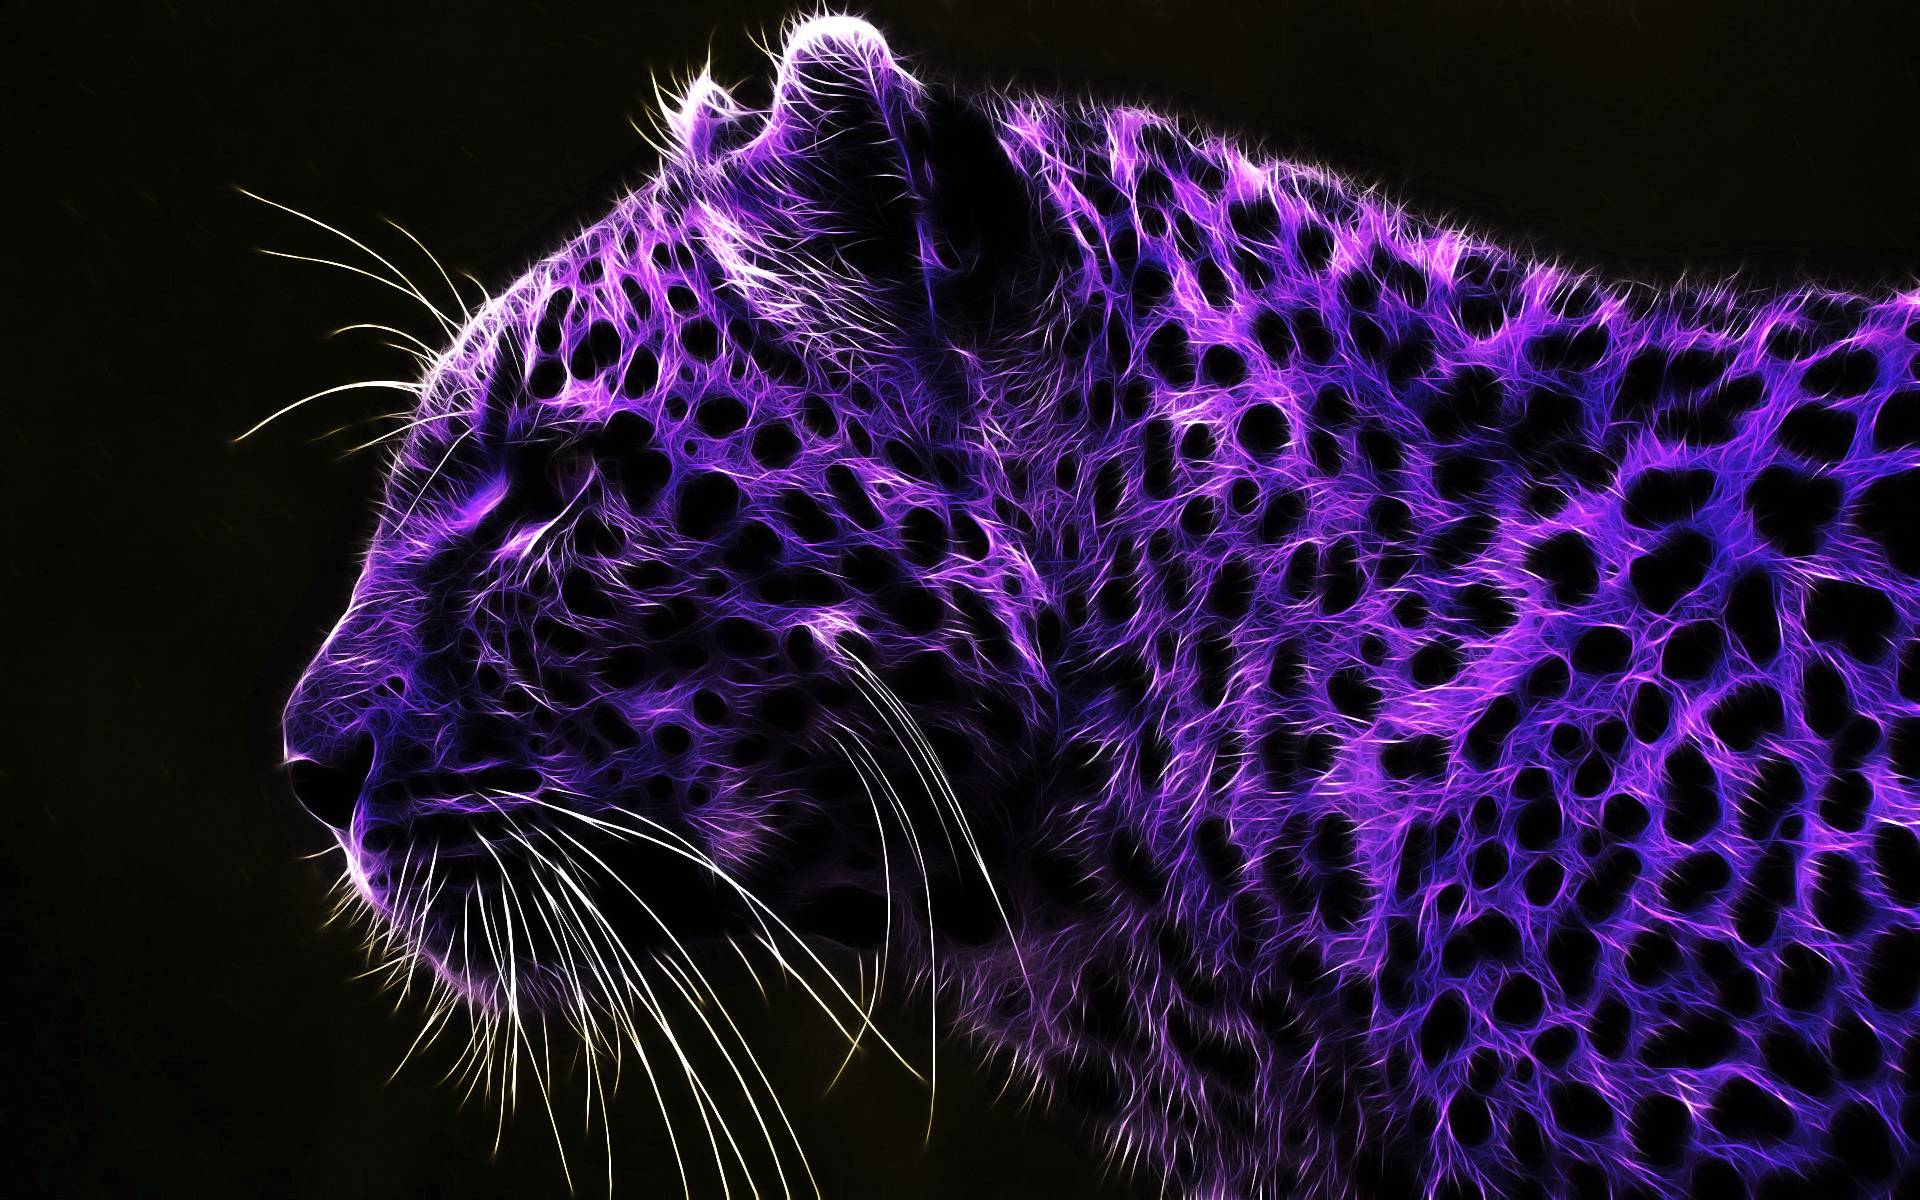 Neon Animal Print Wallpaper Purple Hd Wallpapers Wallpaper Cave